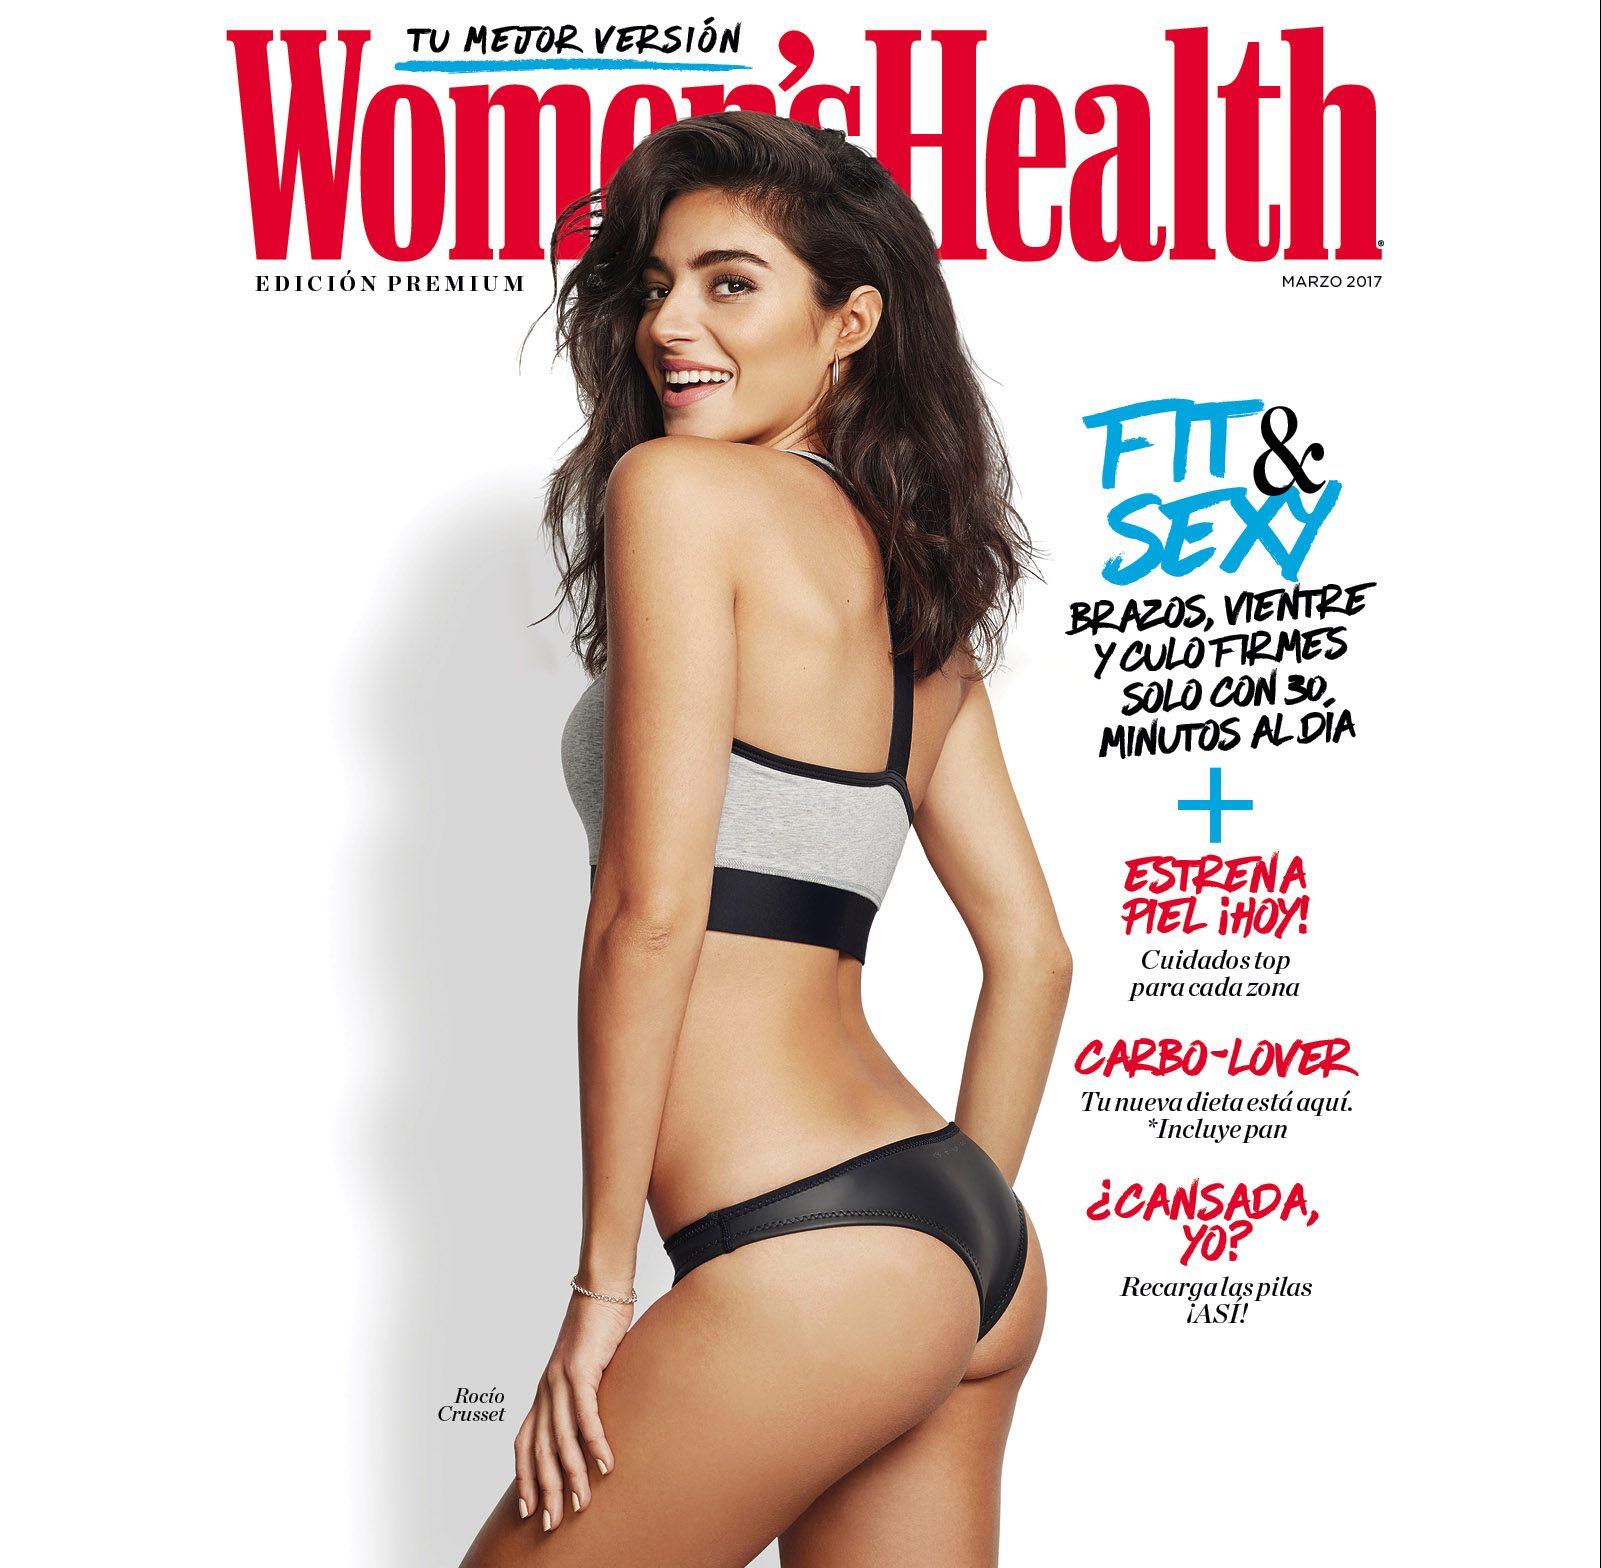 NOW_THEN Rocío Crusset Women's Health Spain